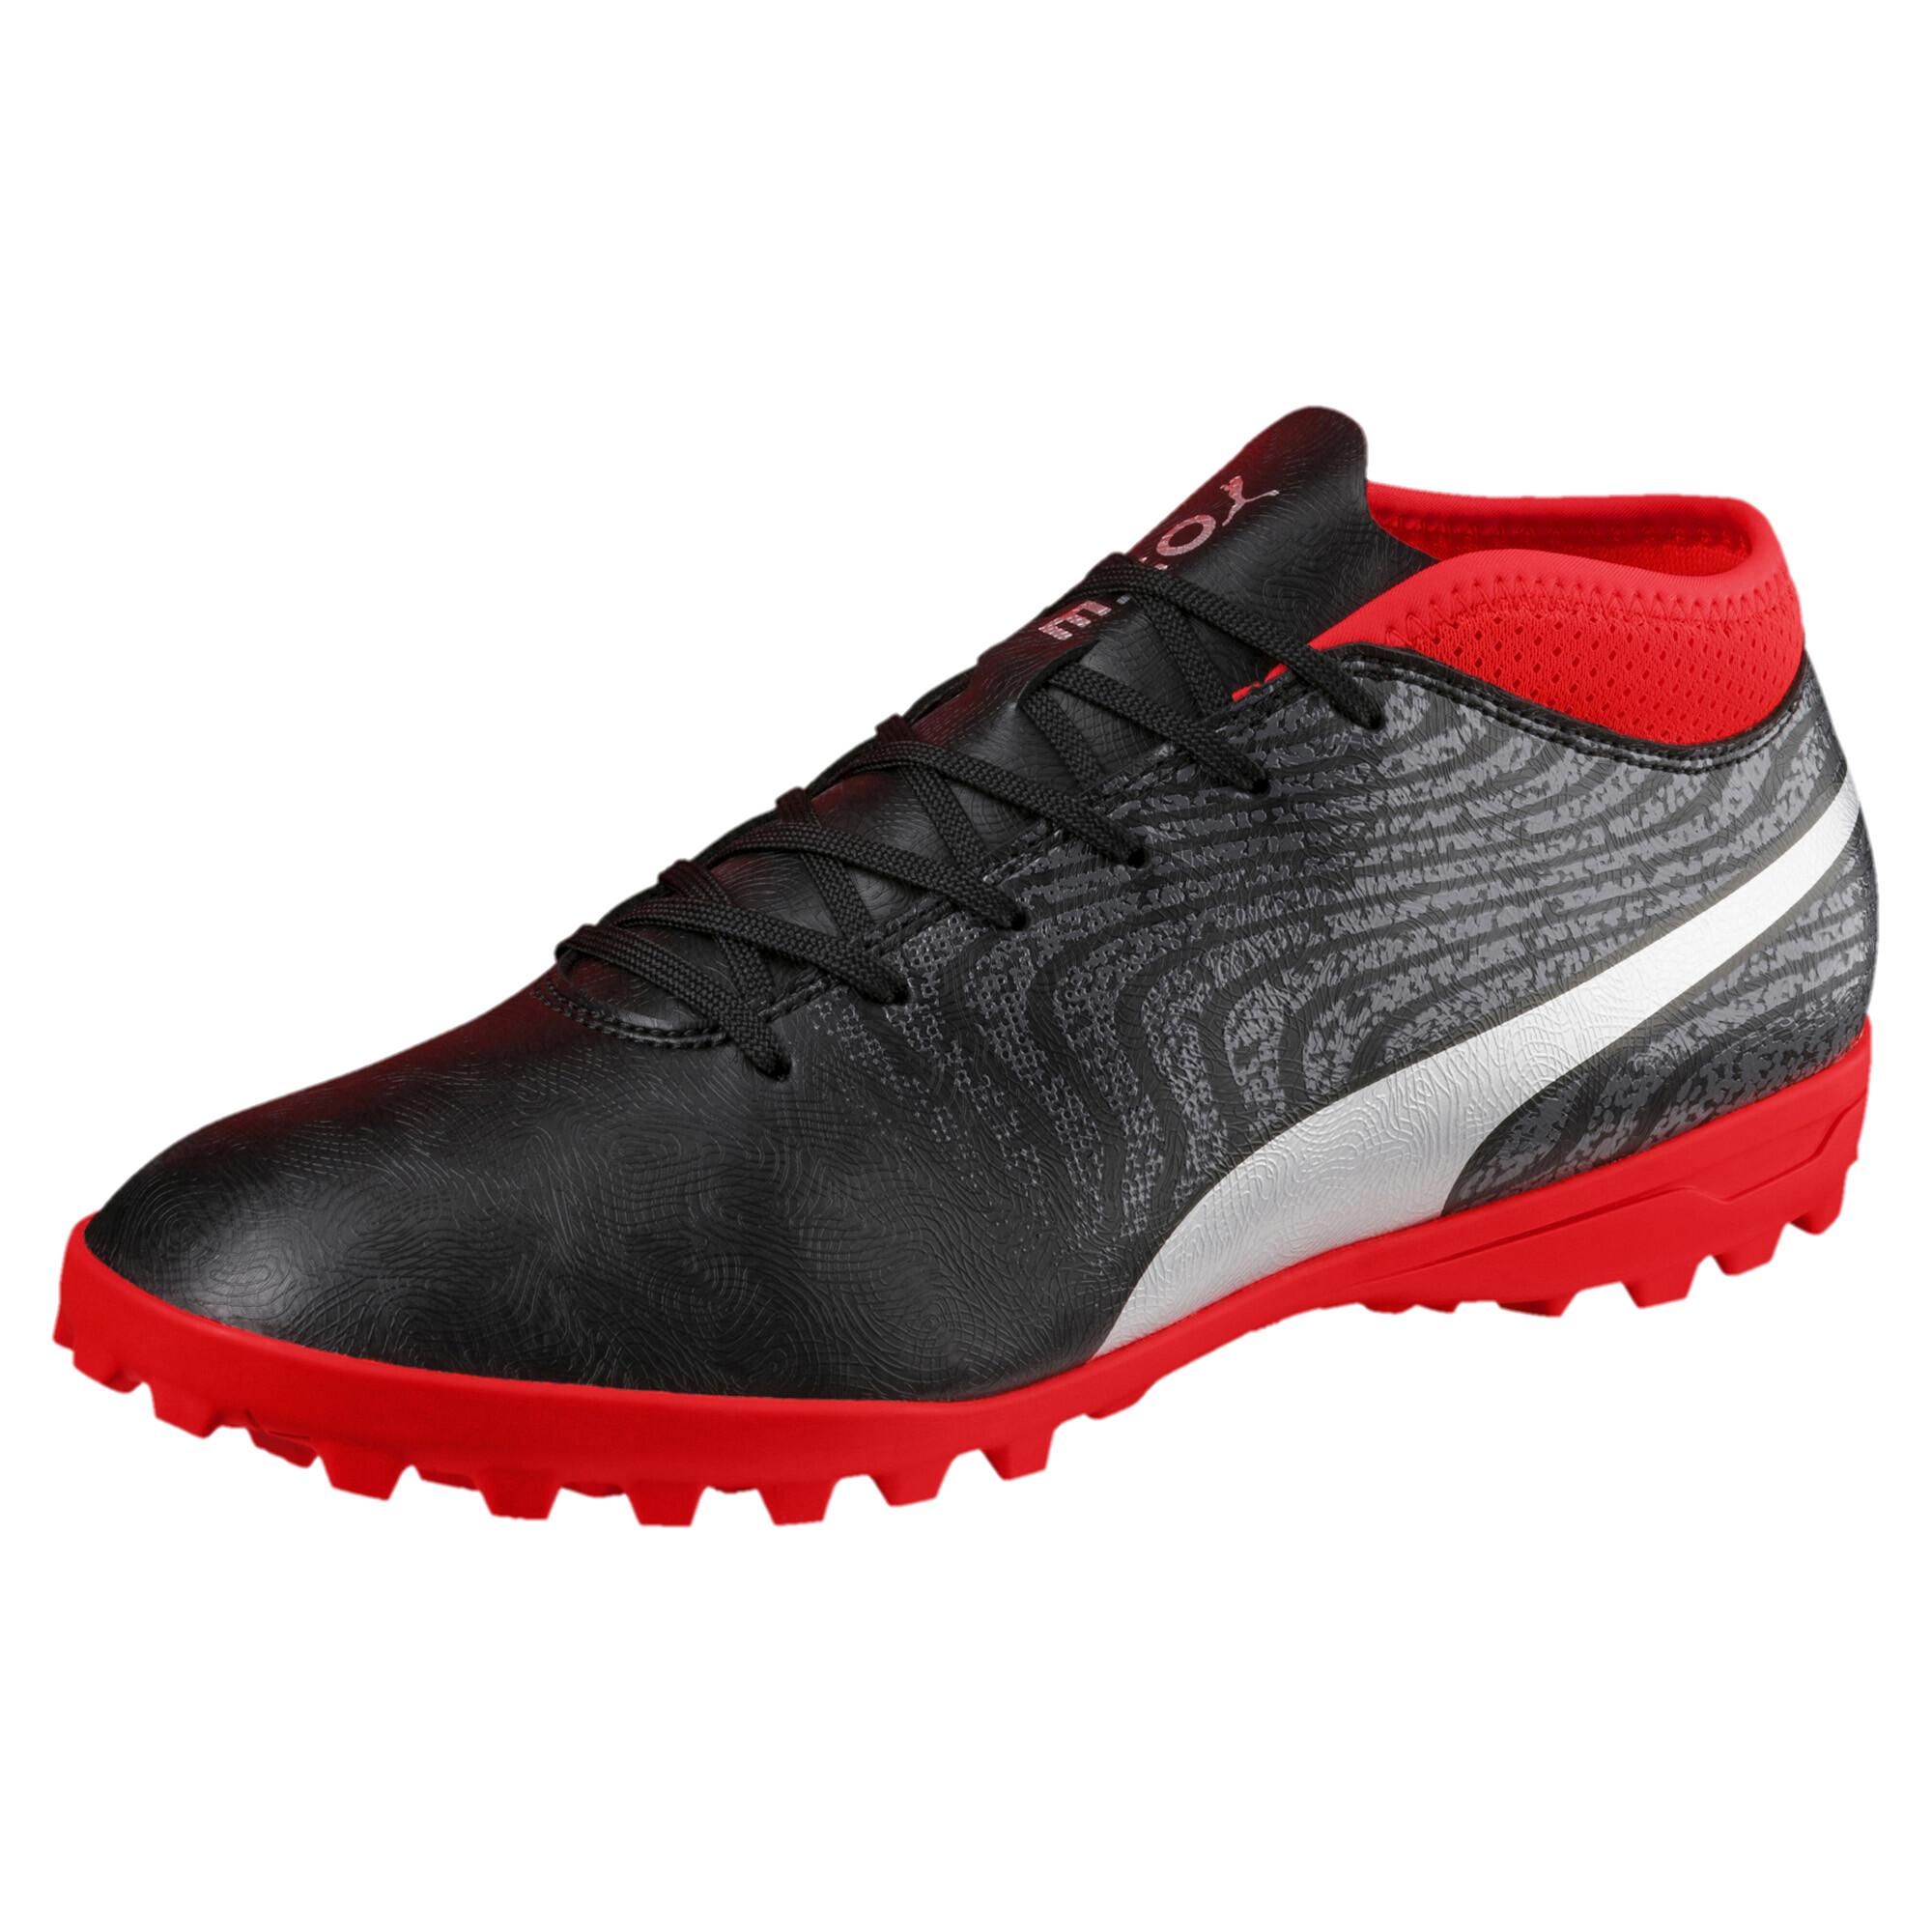 Image Puma Men's PUMA ONE 18.4 TT Football Boots #1